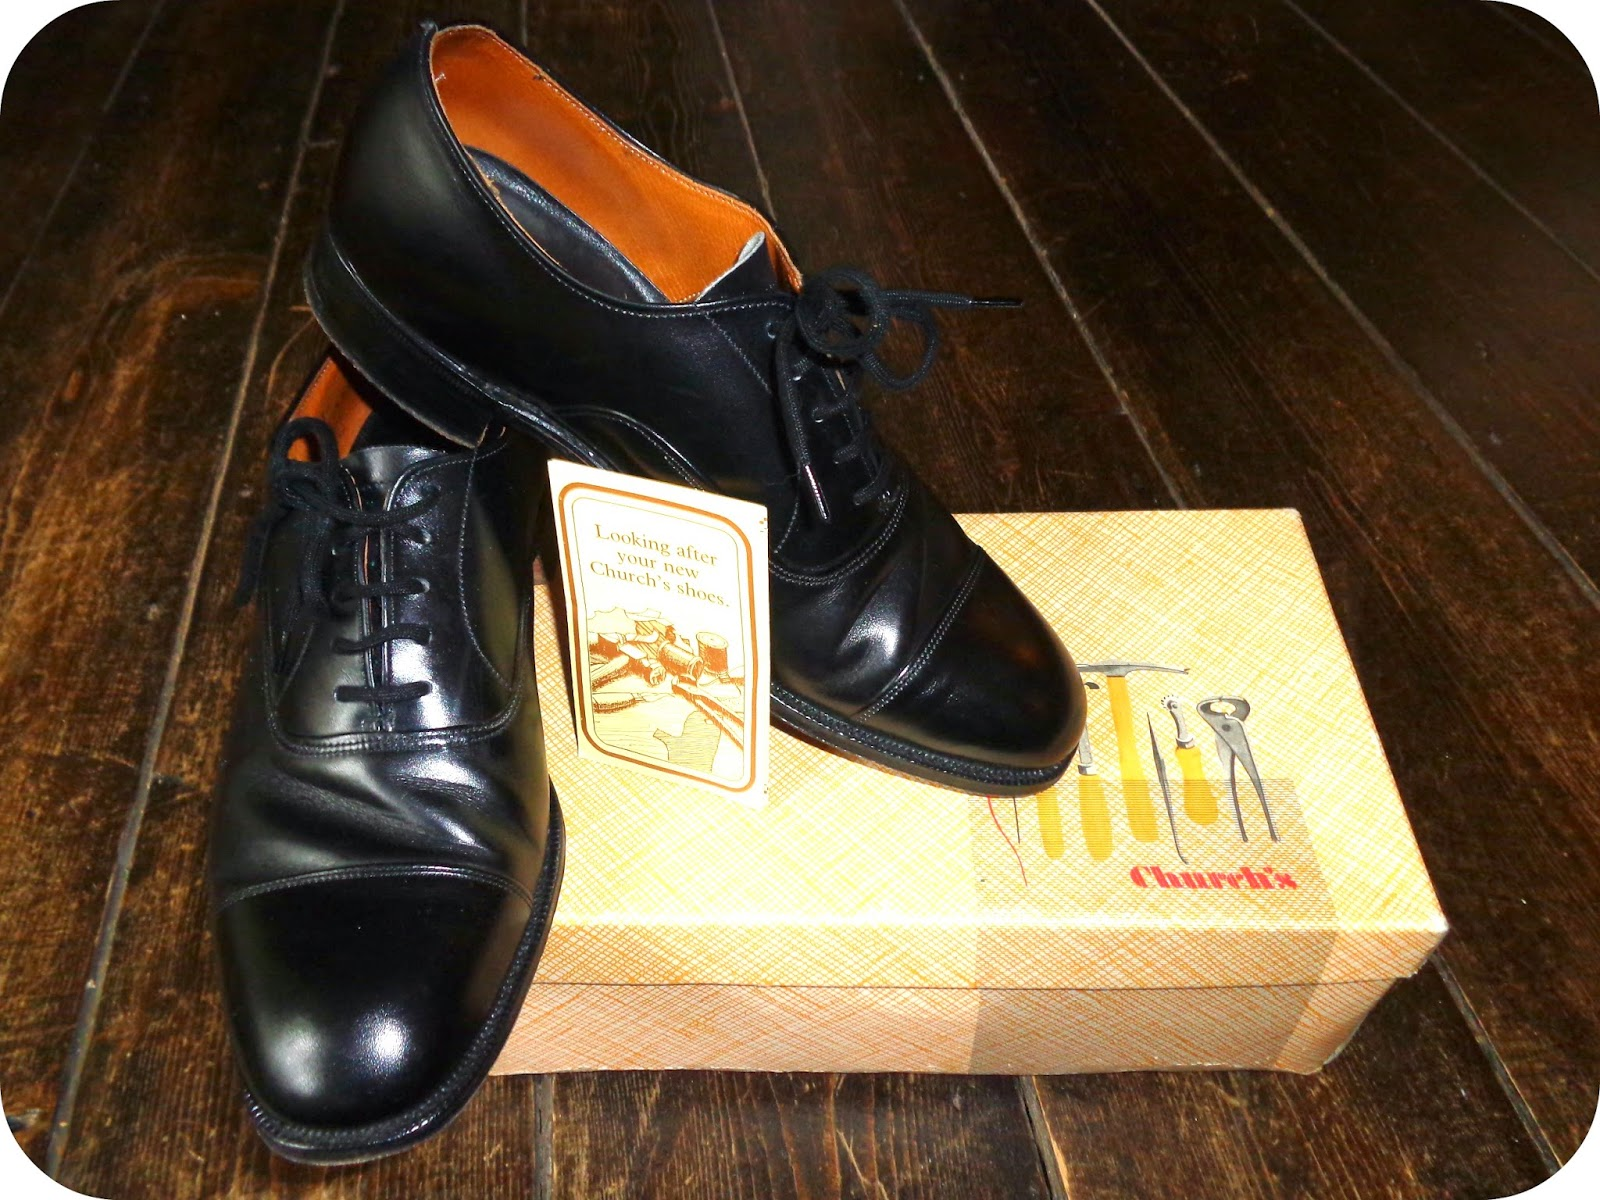 Repairing Crockett And Jones Shoes